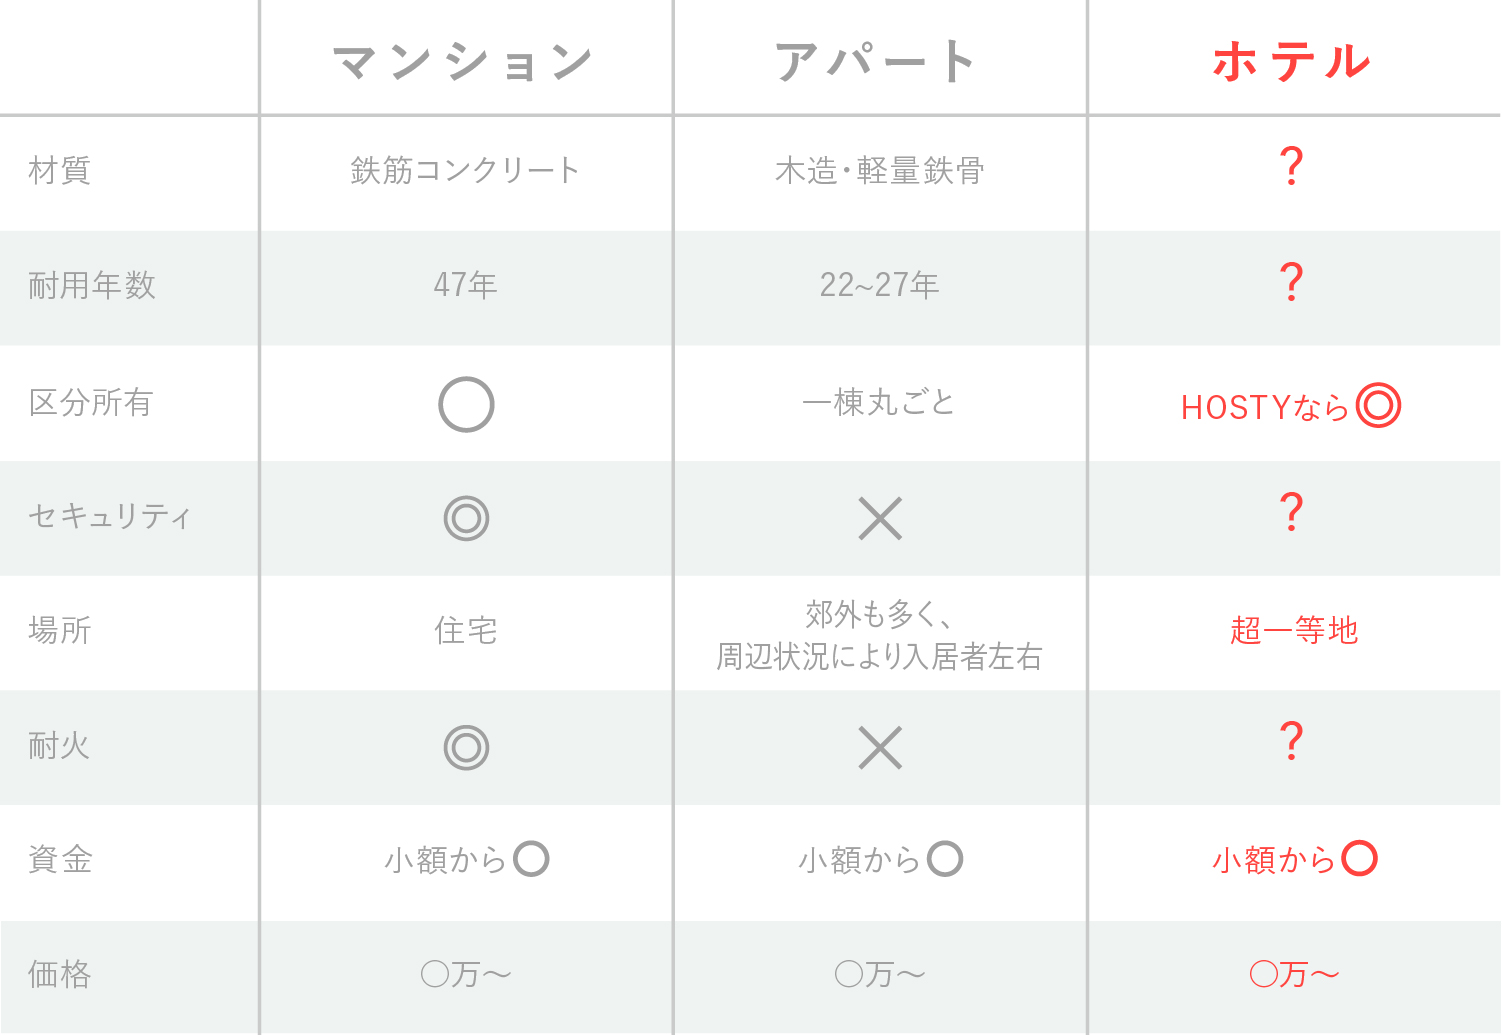 1025_HOSTY_図_表 -10.jpg